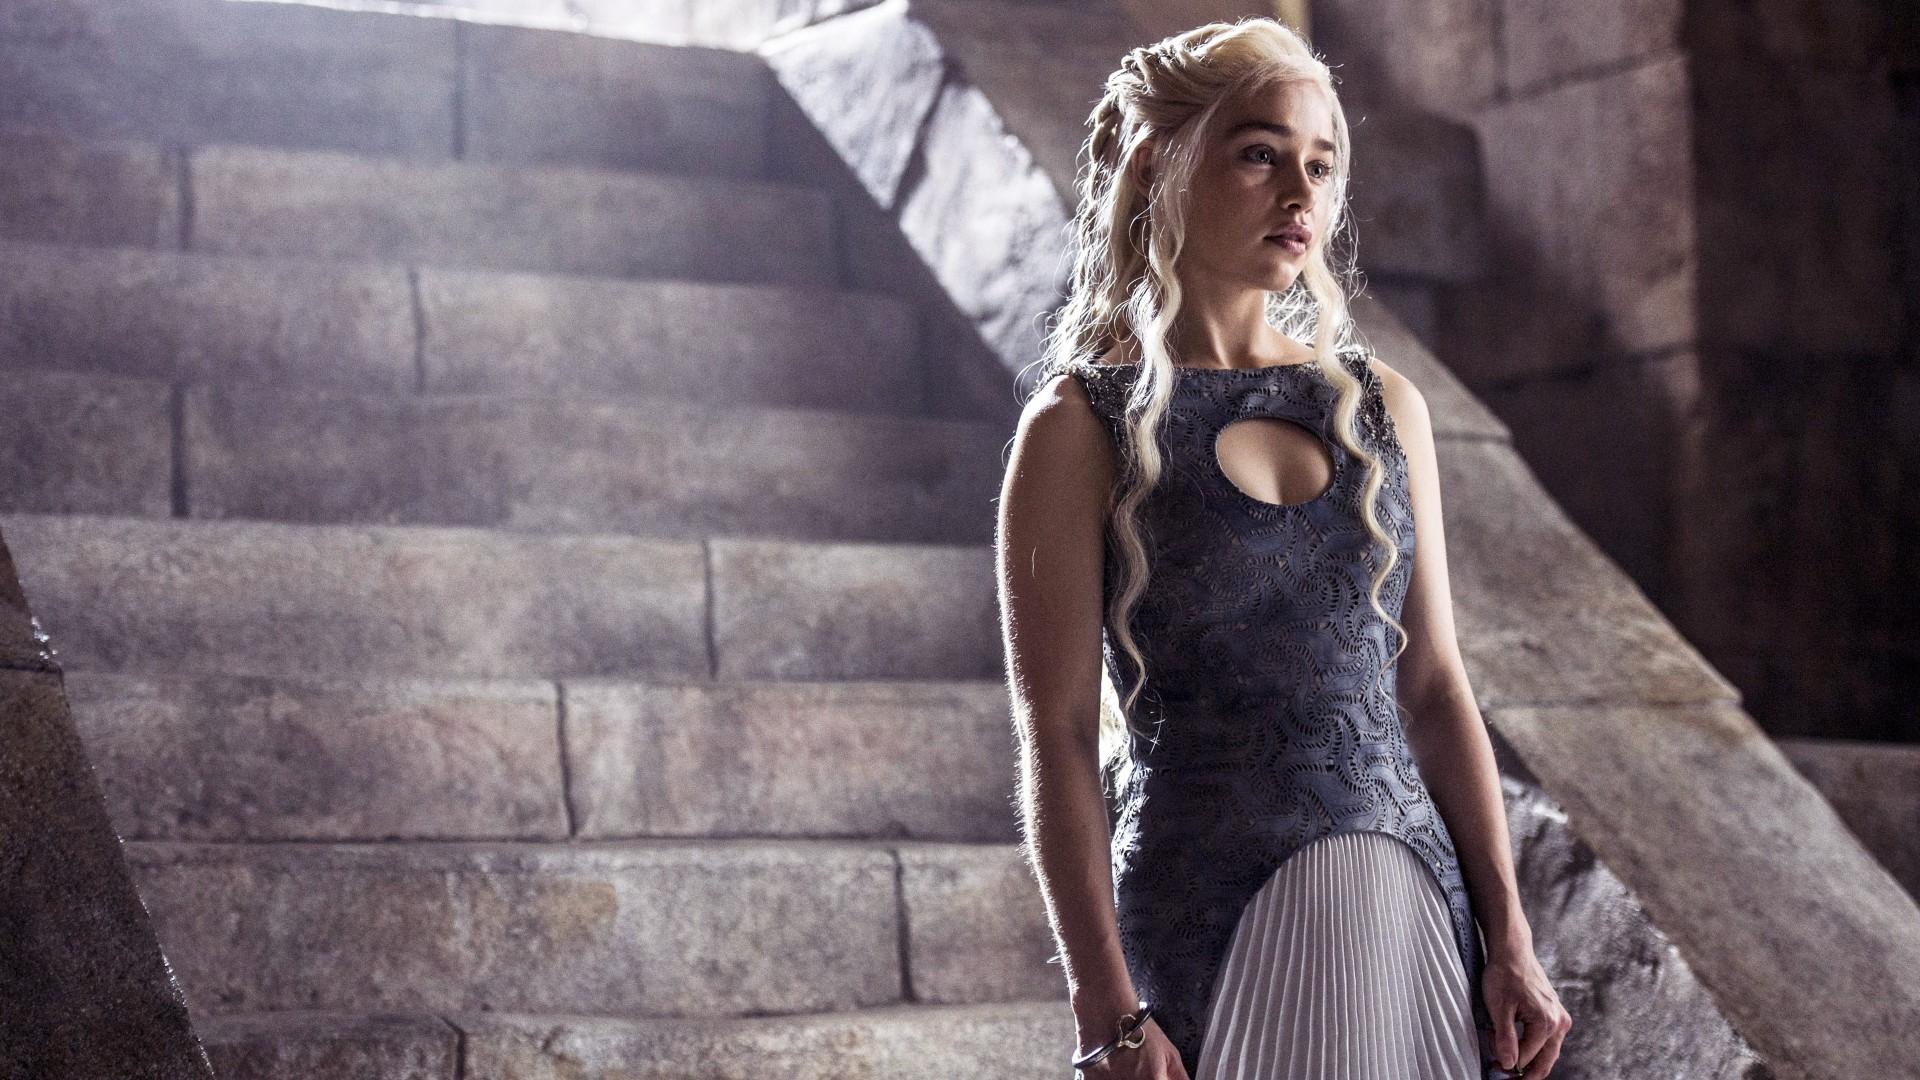 Wallpaper Emilia Clarke, Daenerys Targaryen, Game of Thrones, 4K, TV  Series, #344